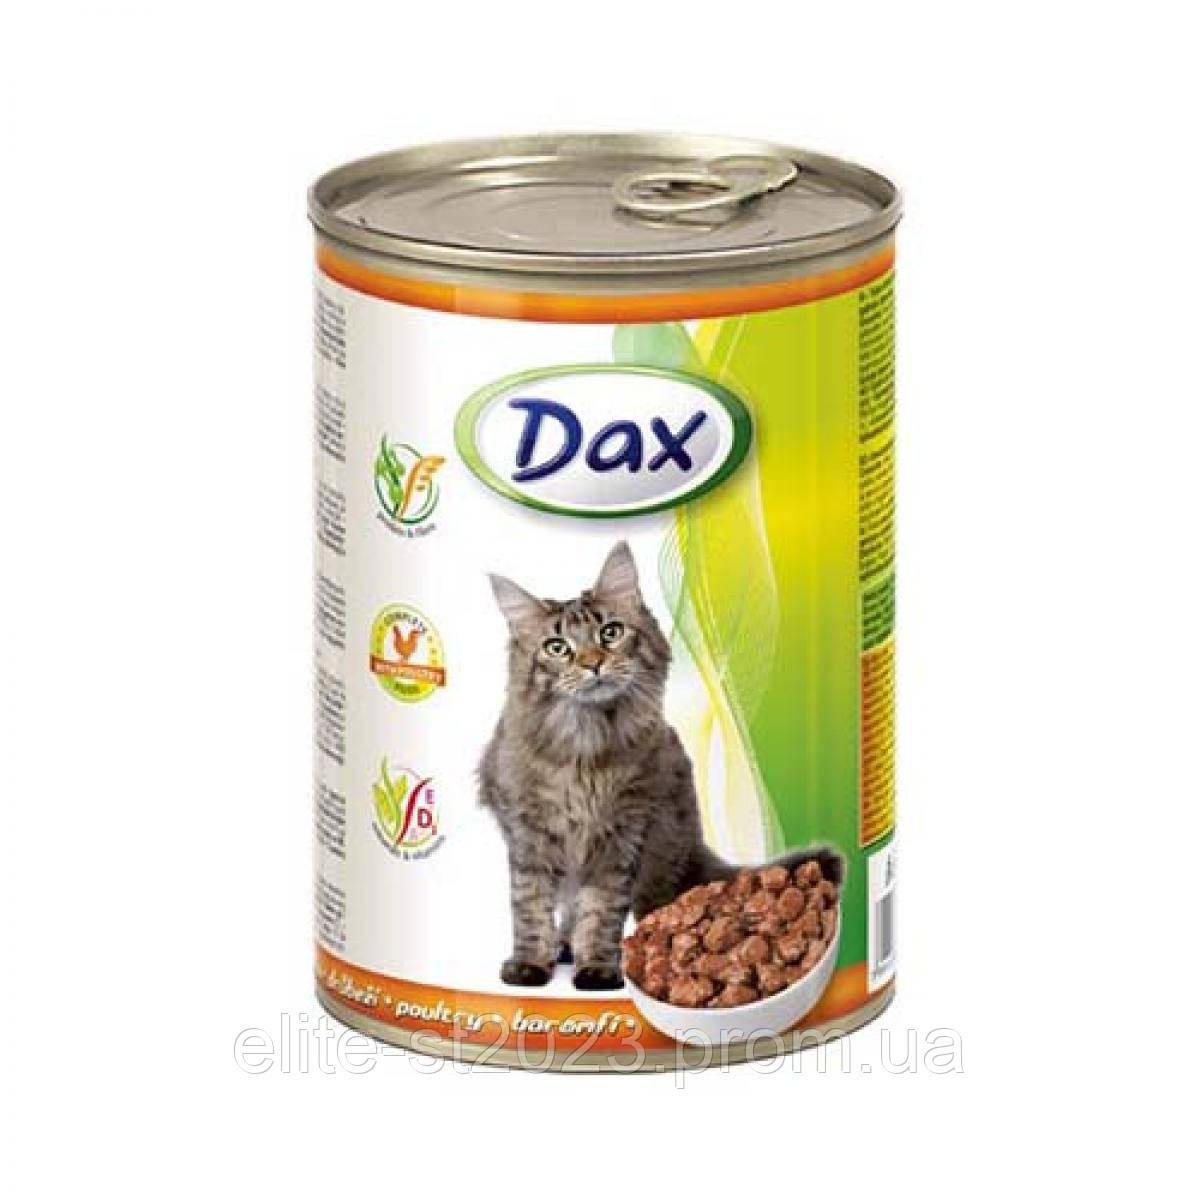 Консерва для кошек Dax птица 415г Дакс